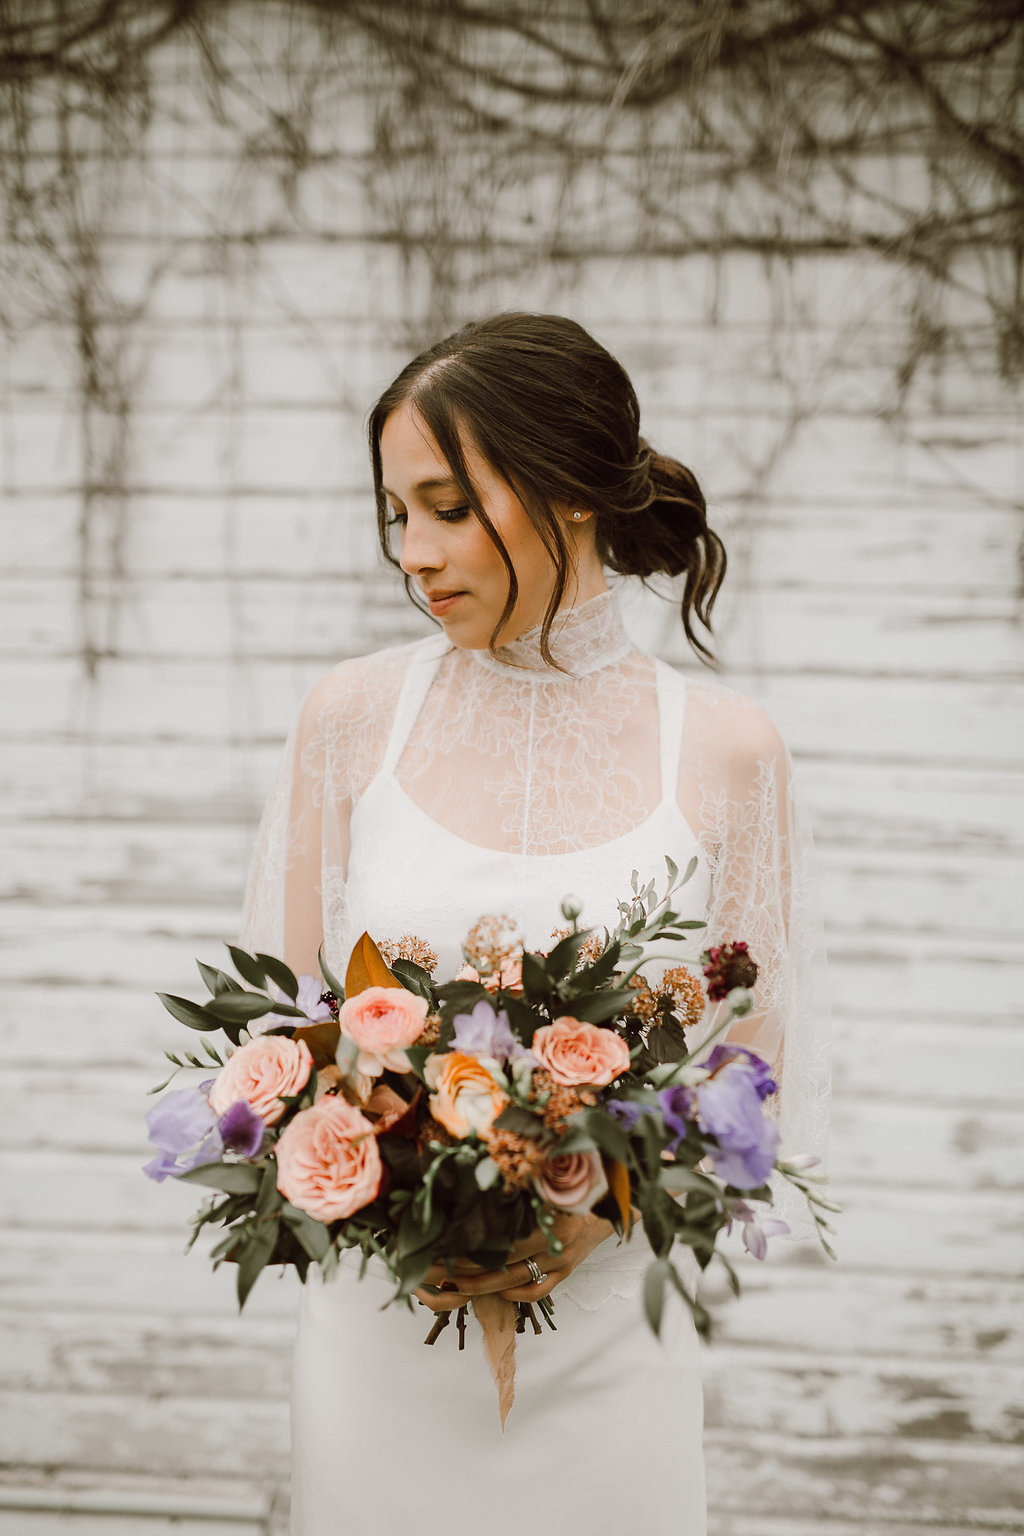 Garden Inspired Bridal Bouquet - Wedding Florists in Winnipeg